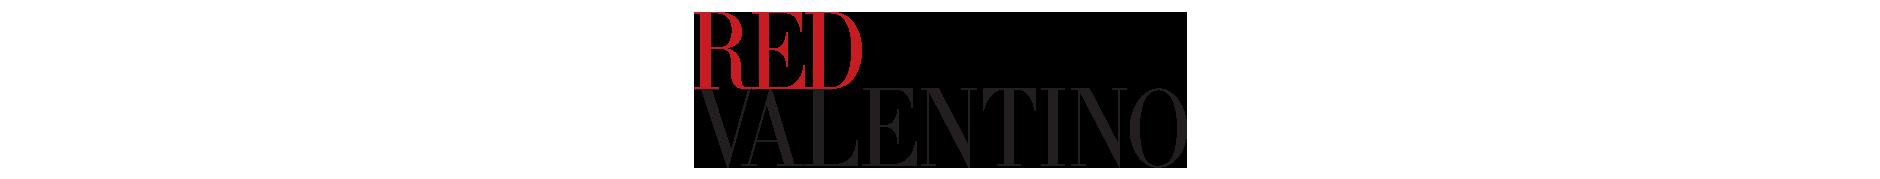 RED Valentino : Dresses, Jackets & Blouses at Bergdorf Goodman.